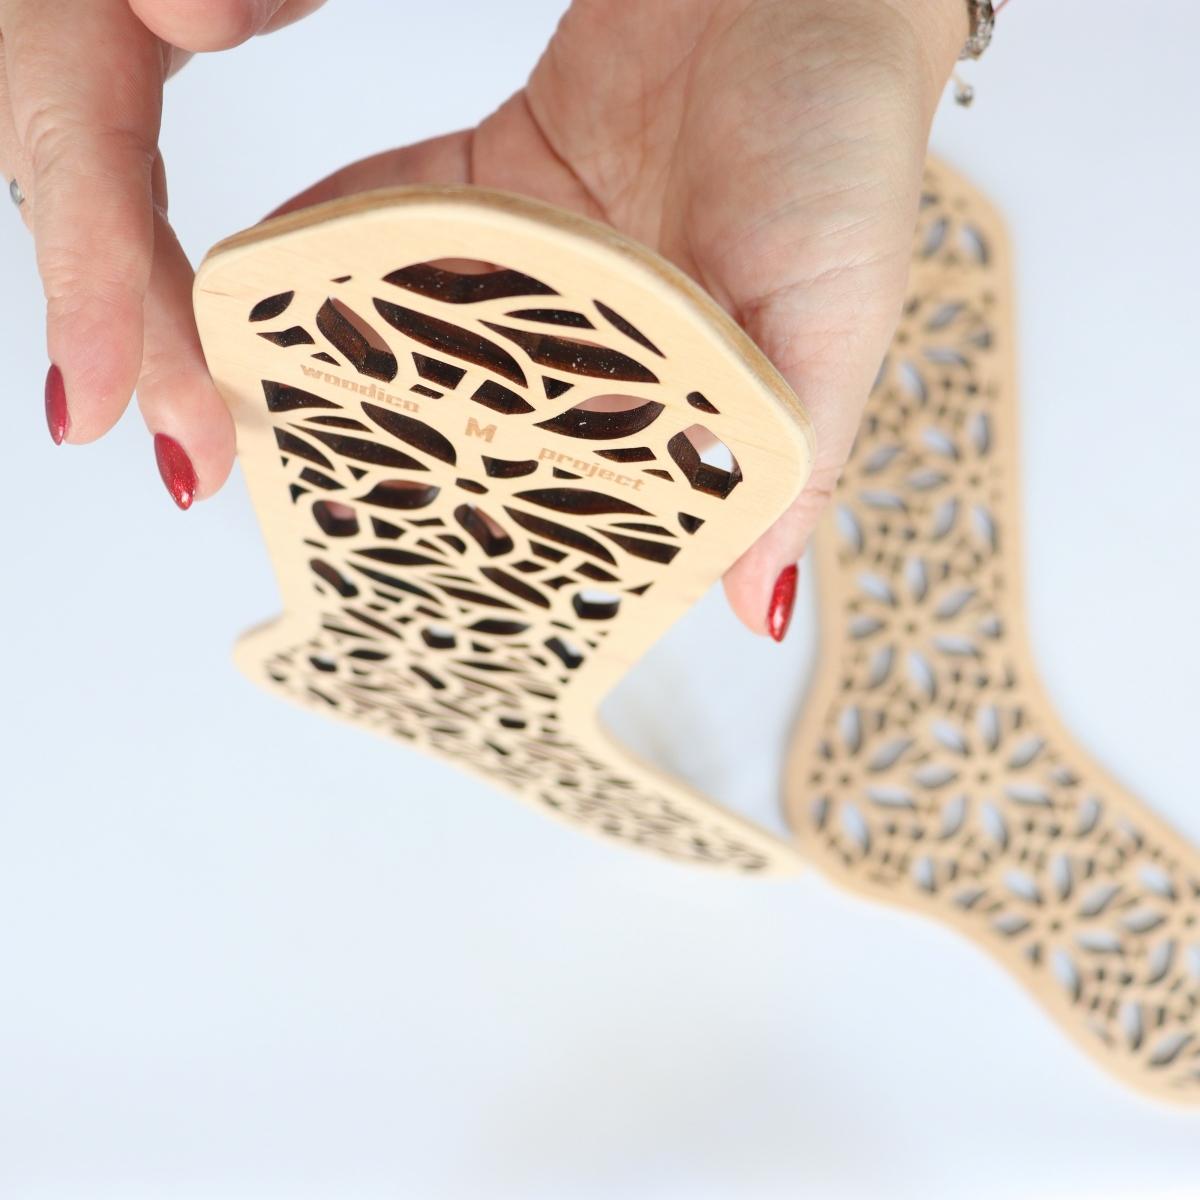 woodico.pro wooden sock blockers chamomile 2 1200x1200 - Wooden sock blockers / Chamomile